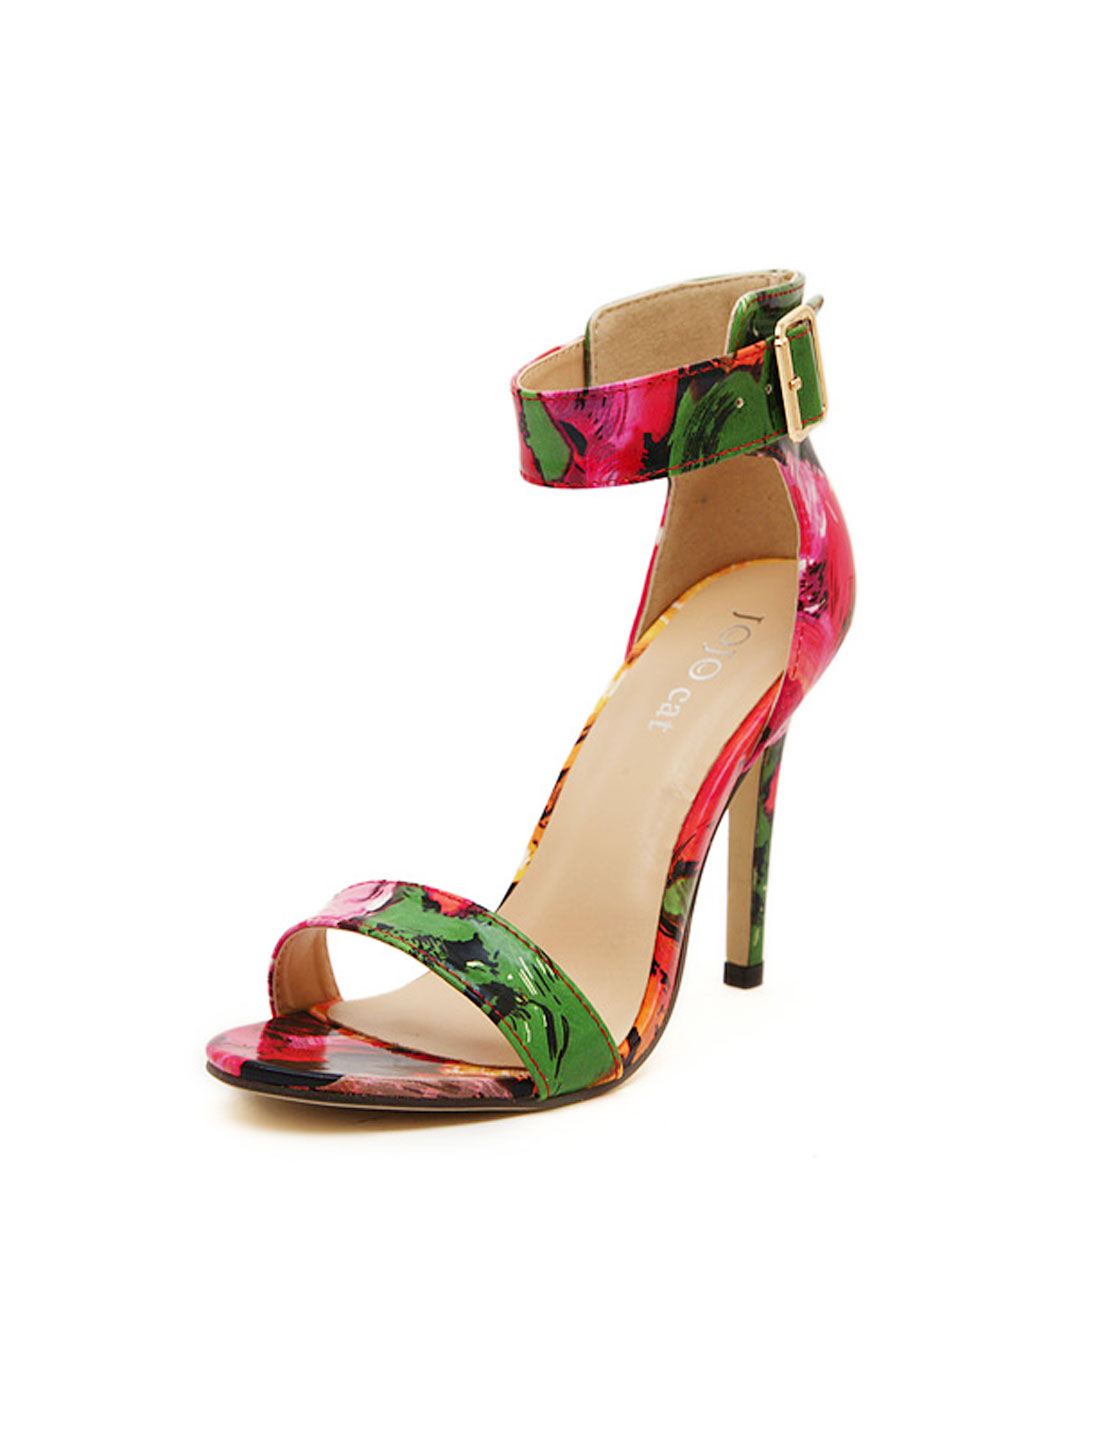 Women Floral Prints High Heels Ankle Strap Sandals Multicolor US 6.5